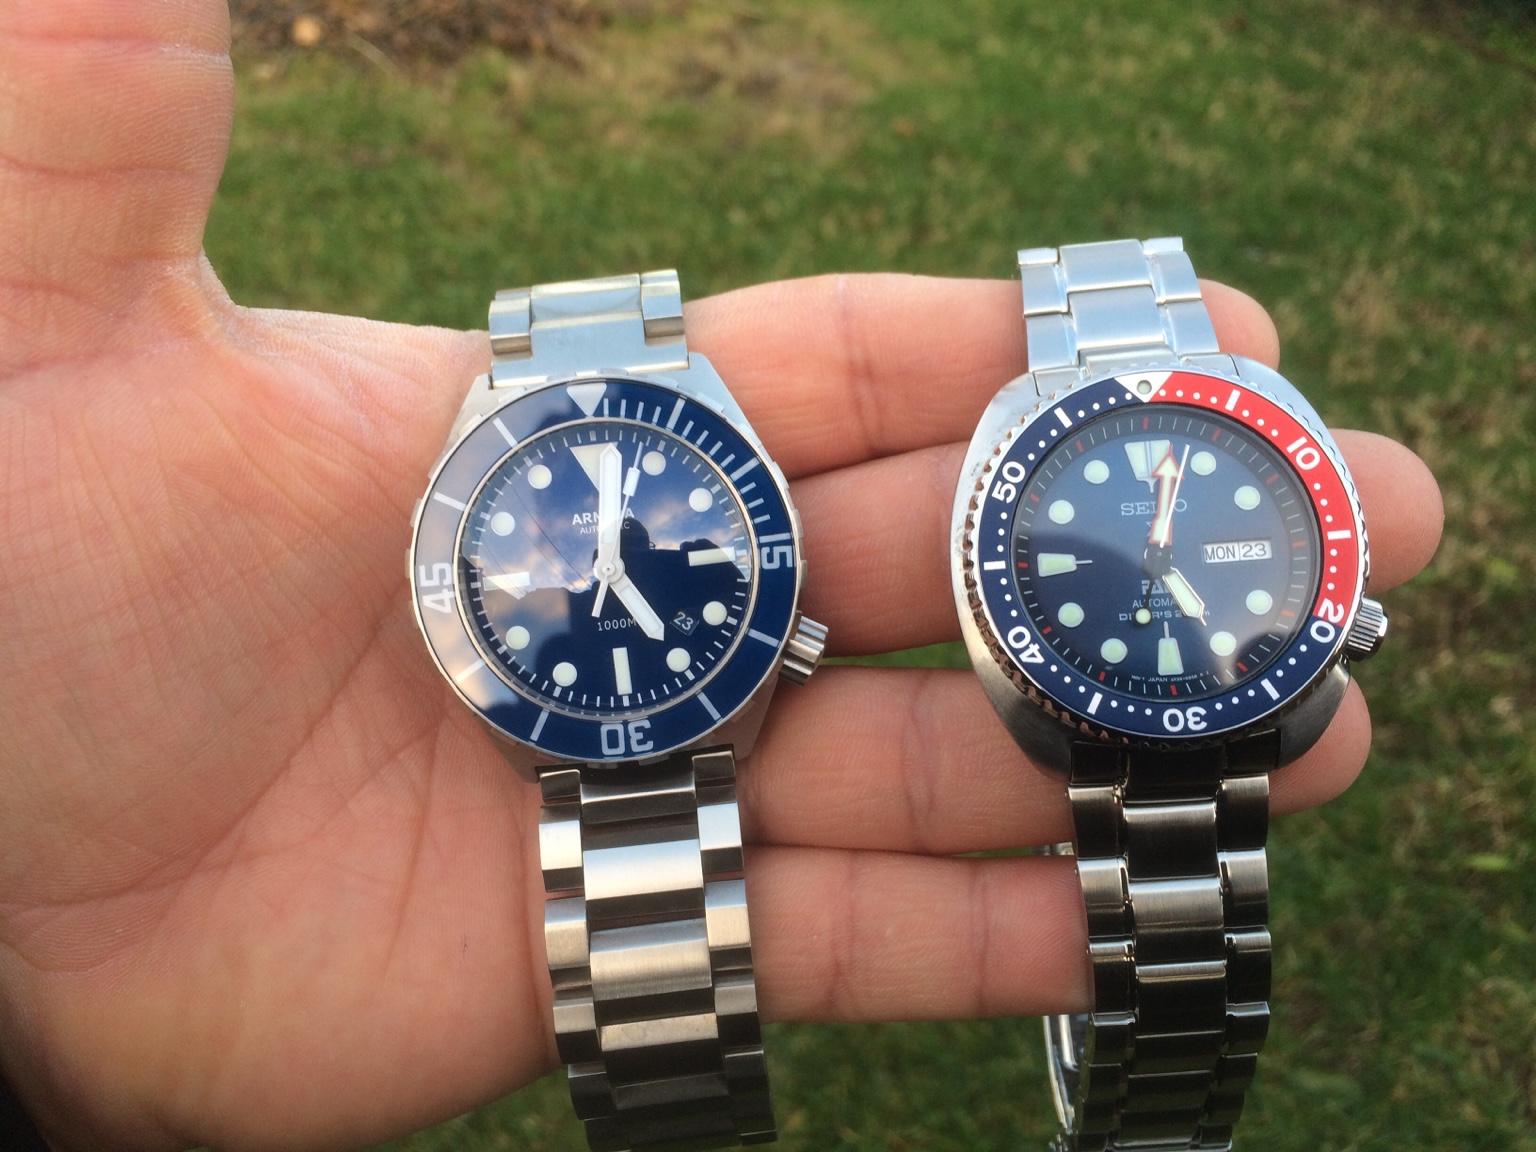 blue 42mm Armida A1 dive watch